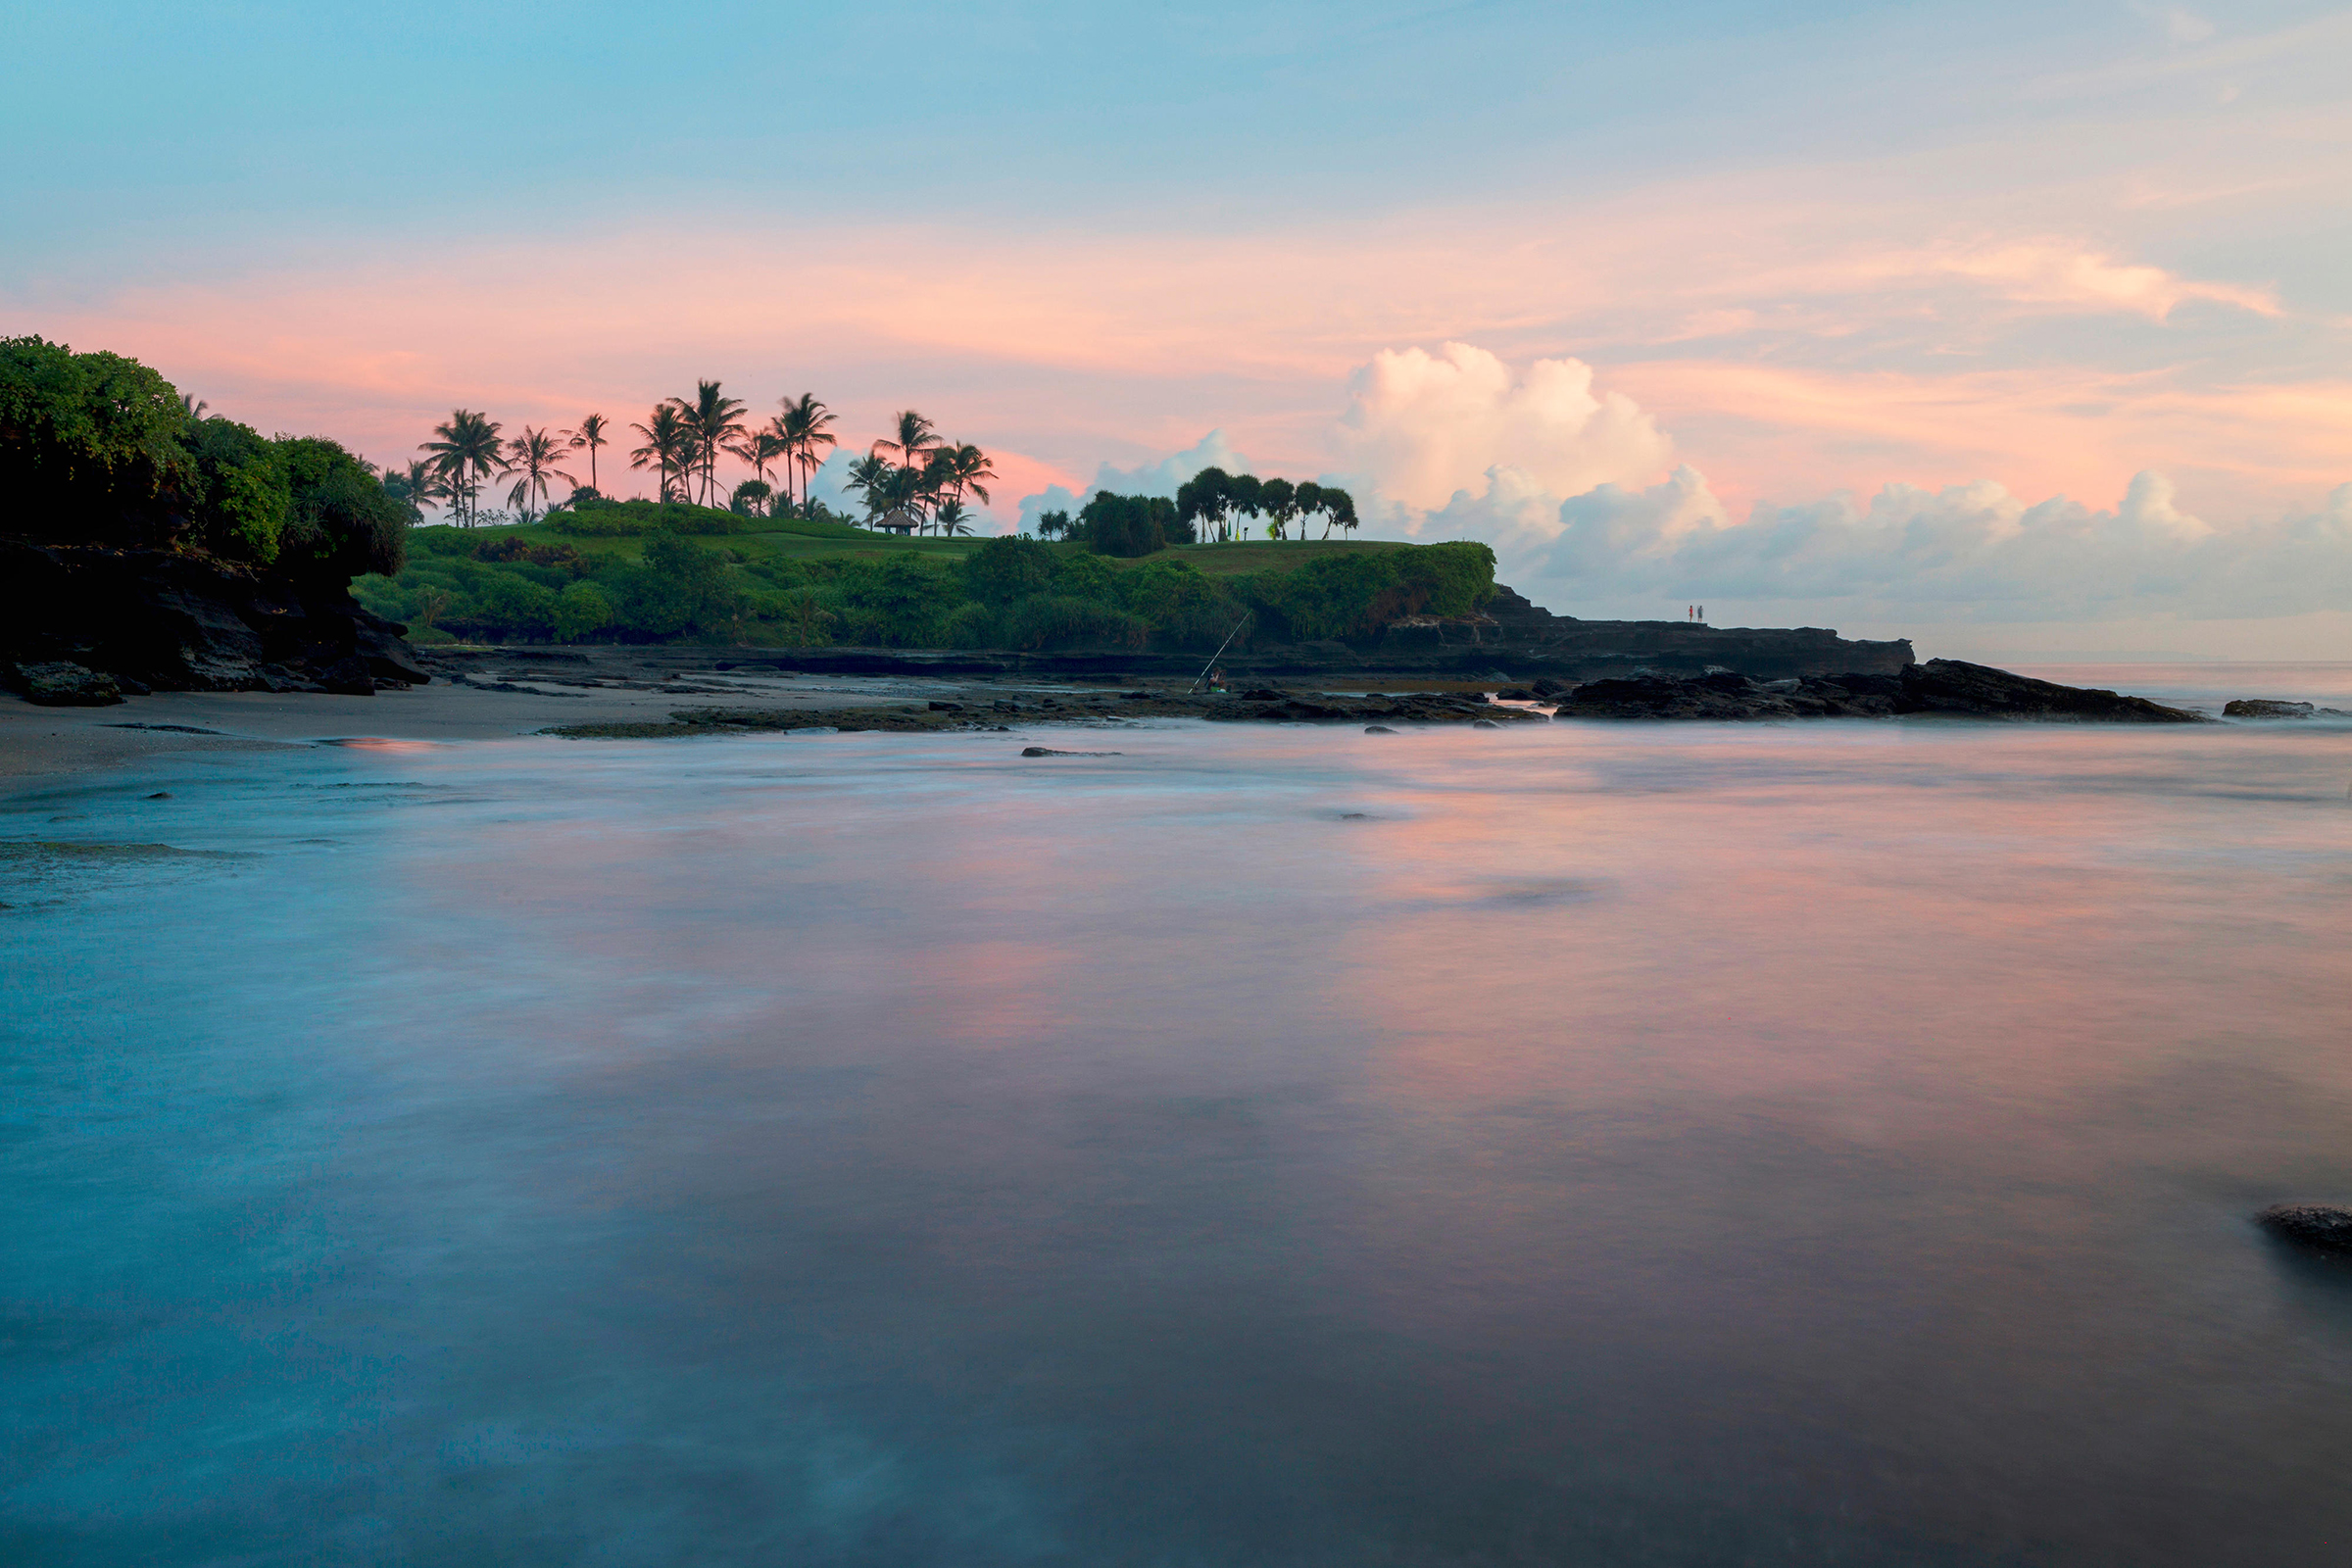 Southern hemisphere travel Bali Indonesia